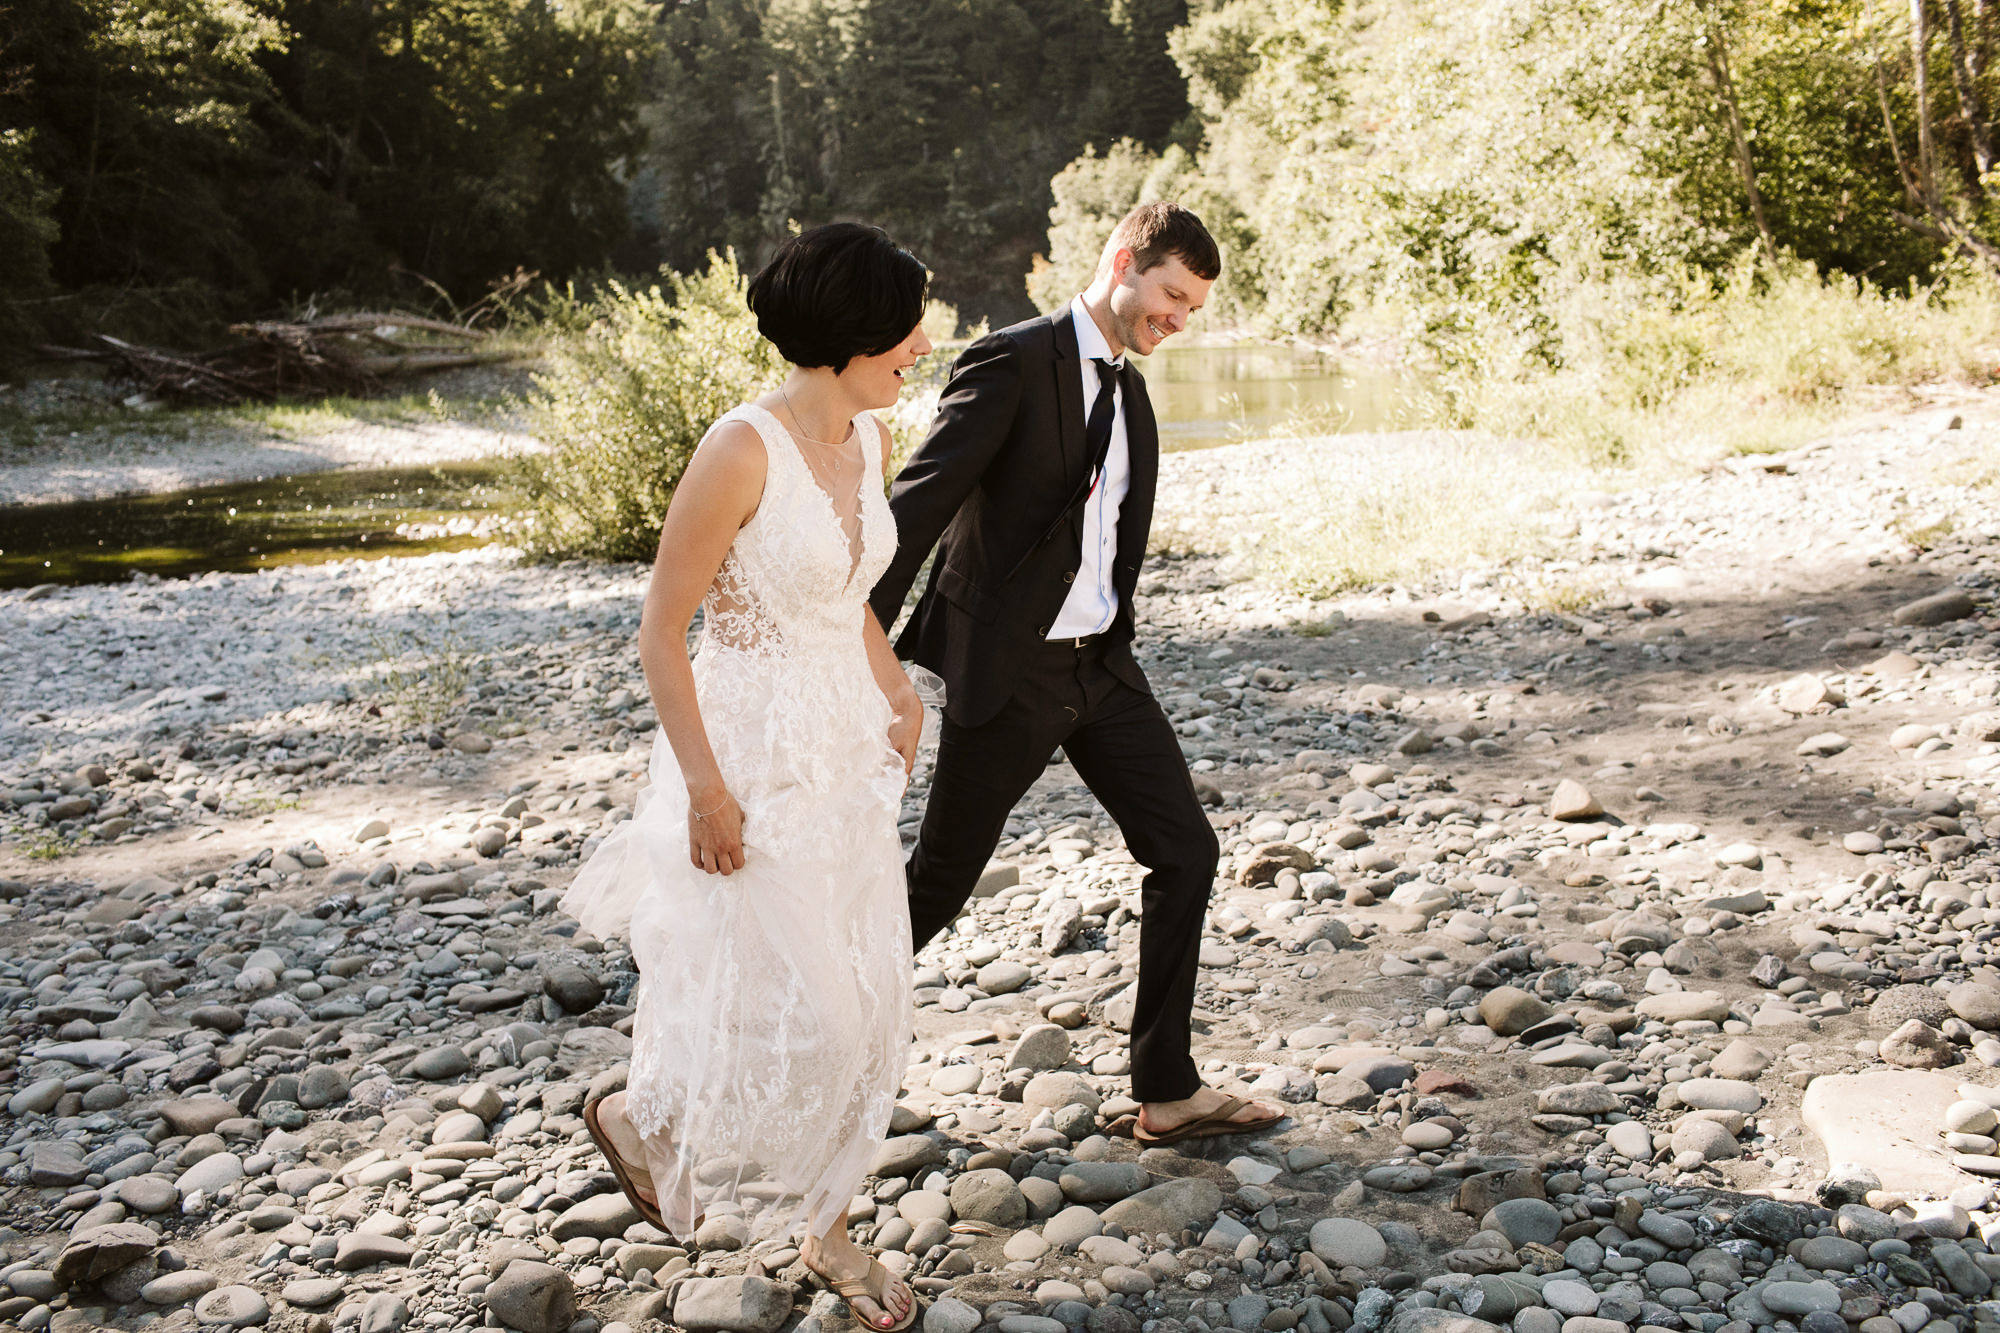 California-wedding-photographer-alfonso-flores-pamplin-groove-267.jpg